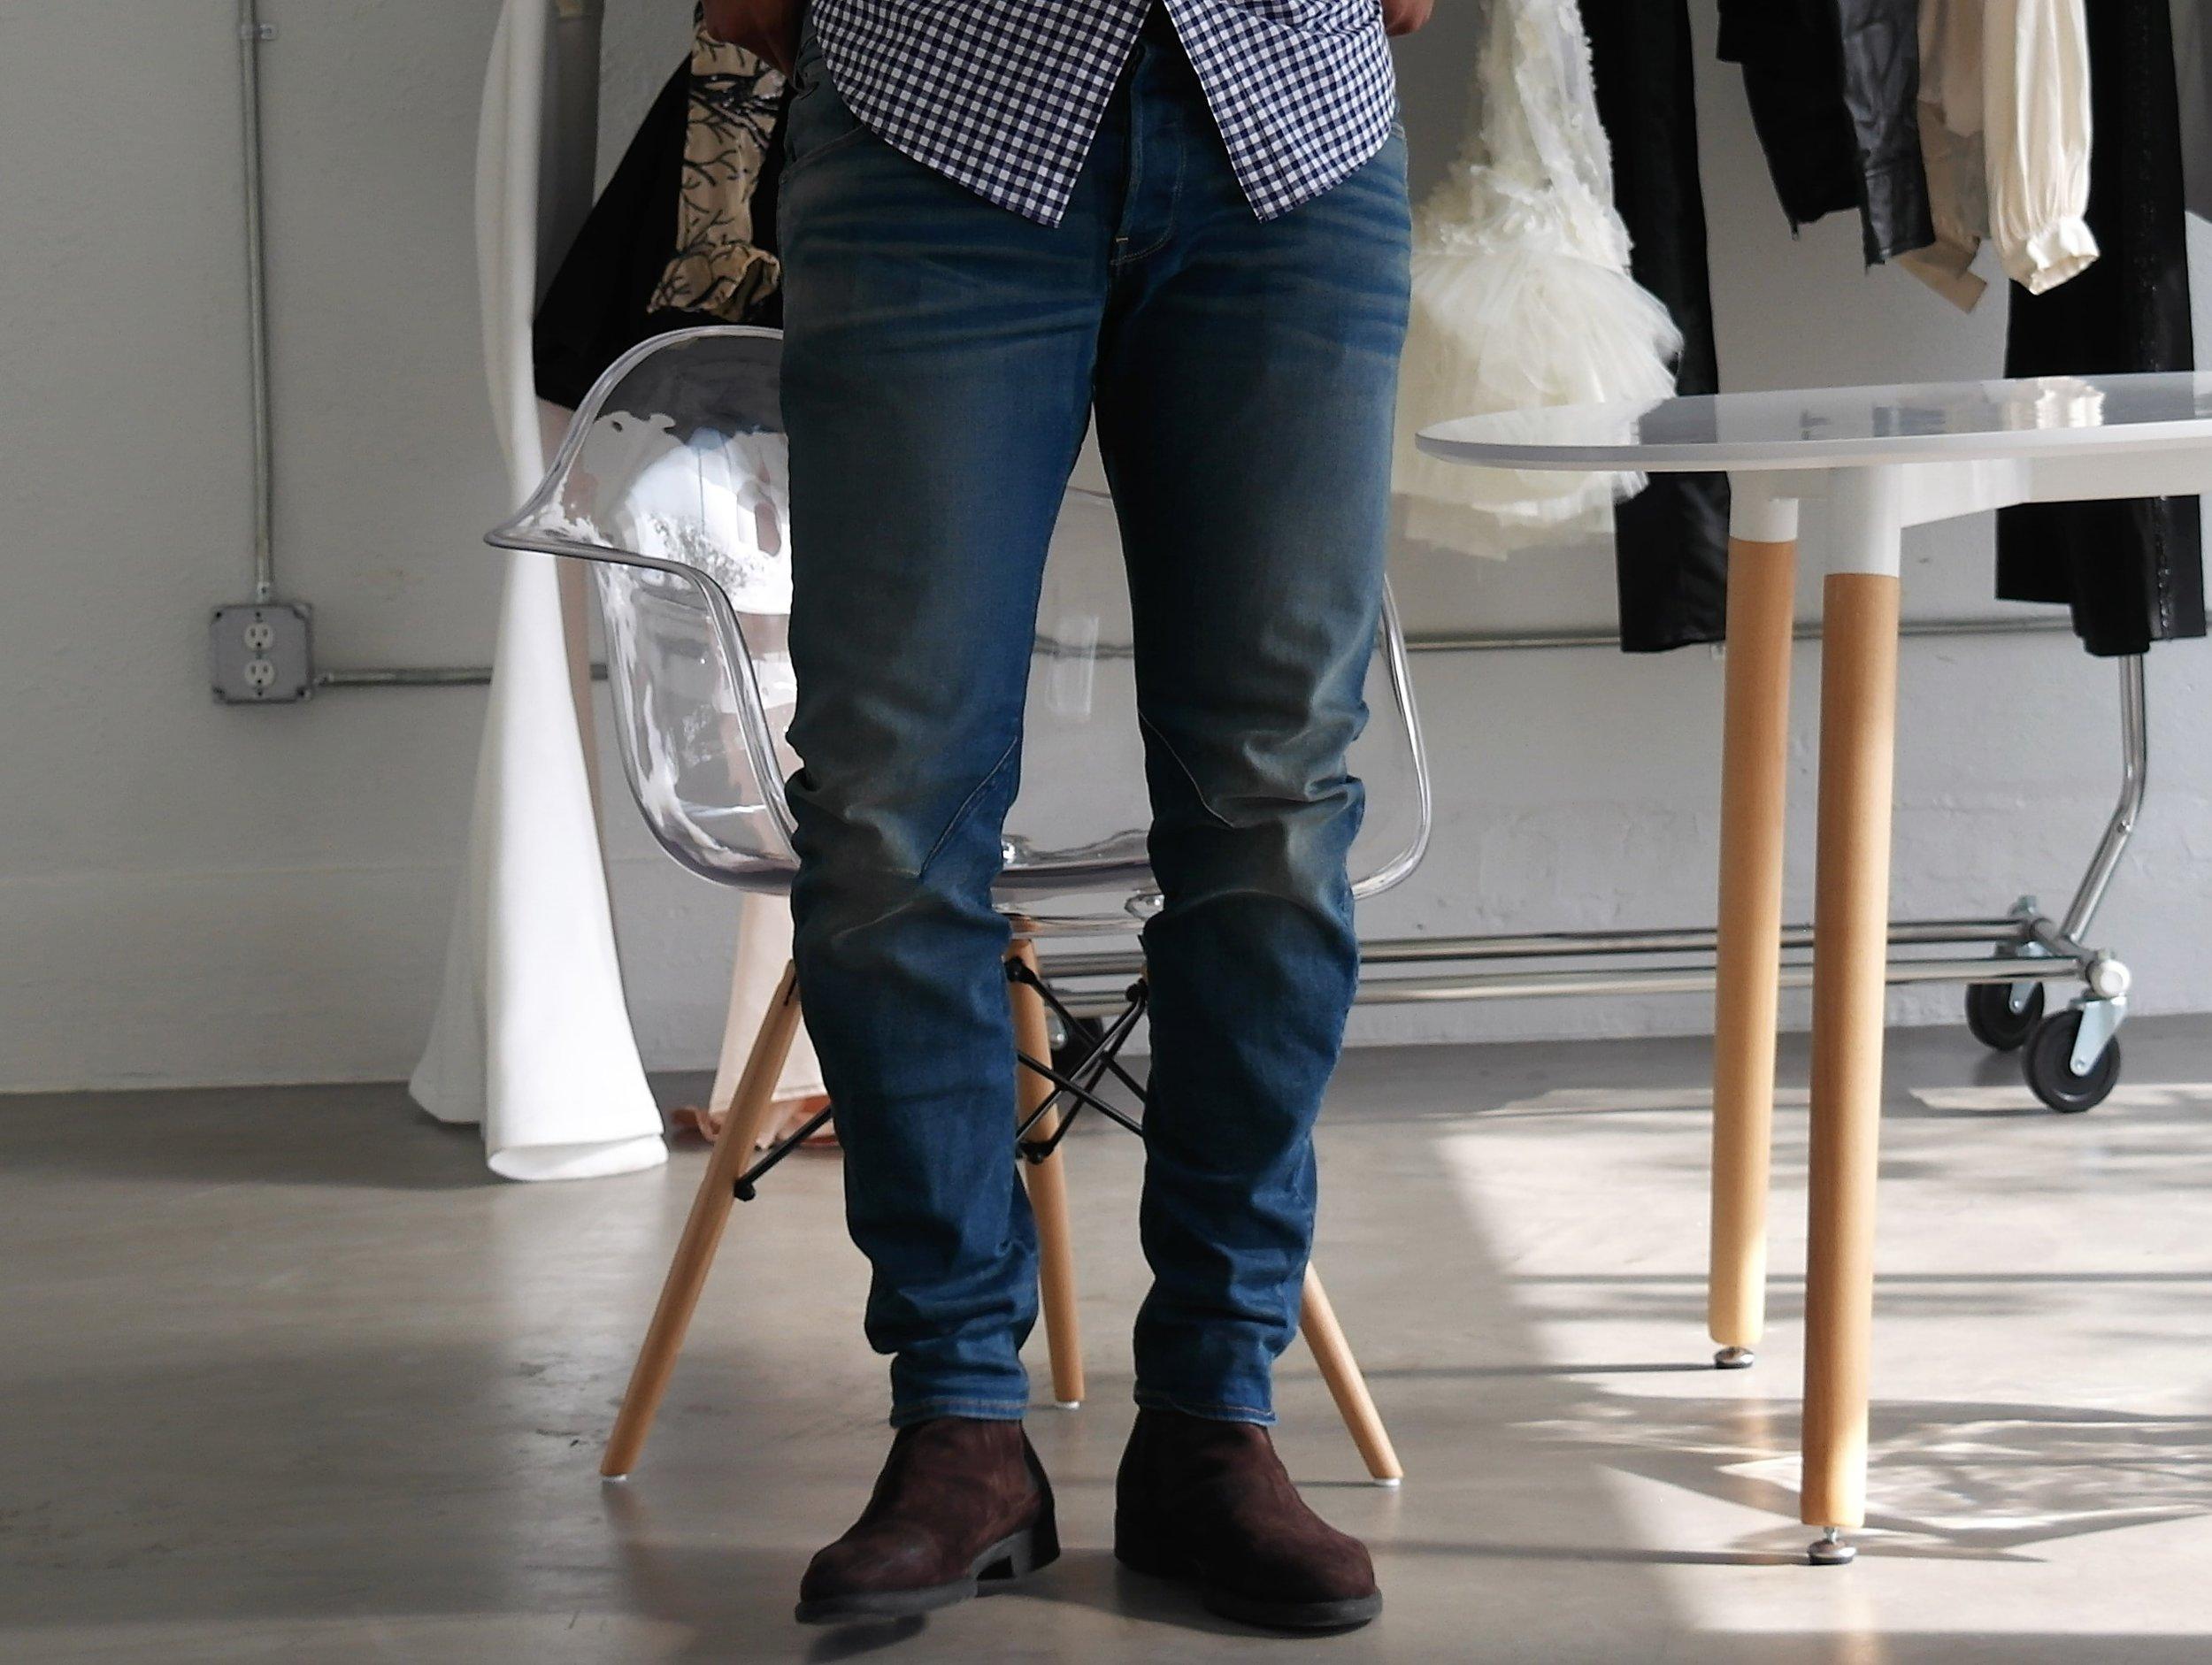 G-Star Denim click    Here       |  Dark Brown Chelsea Boots similar      Here